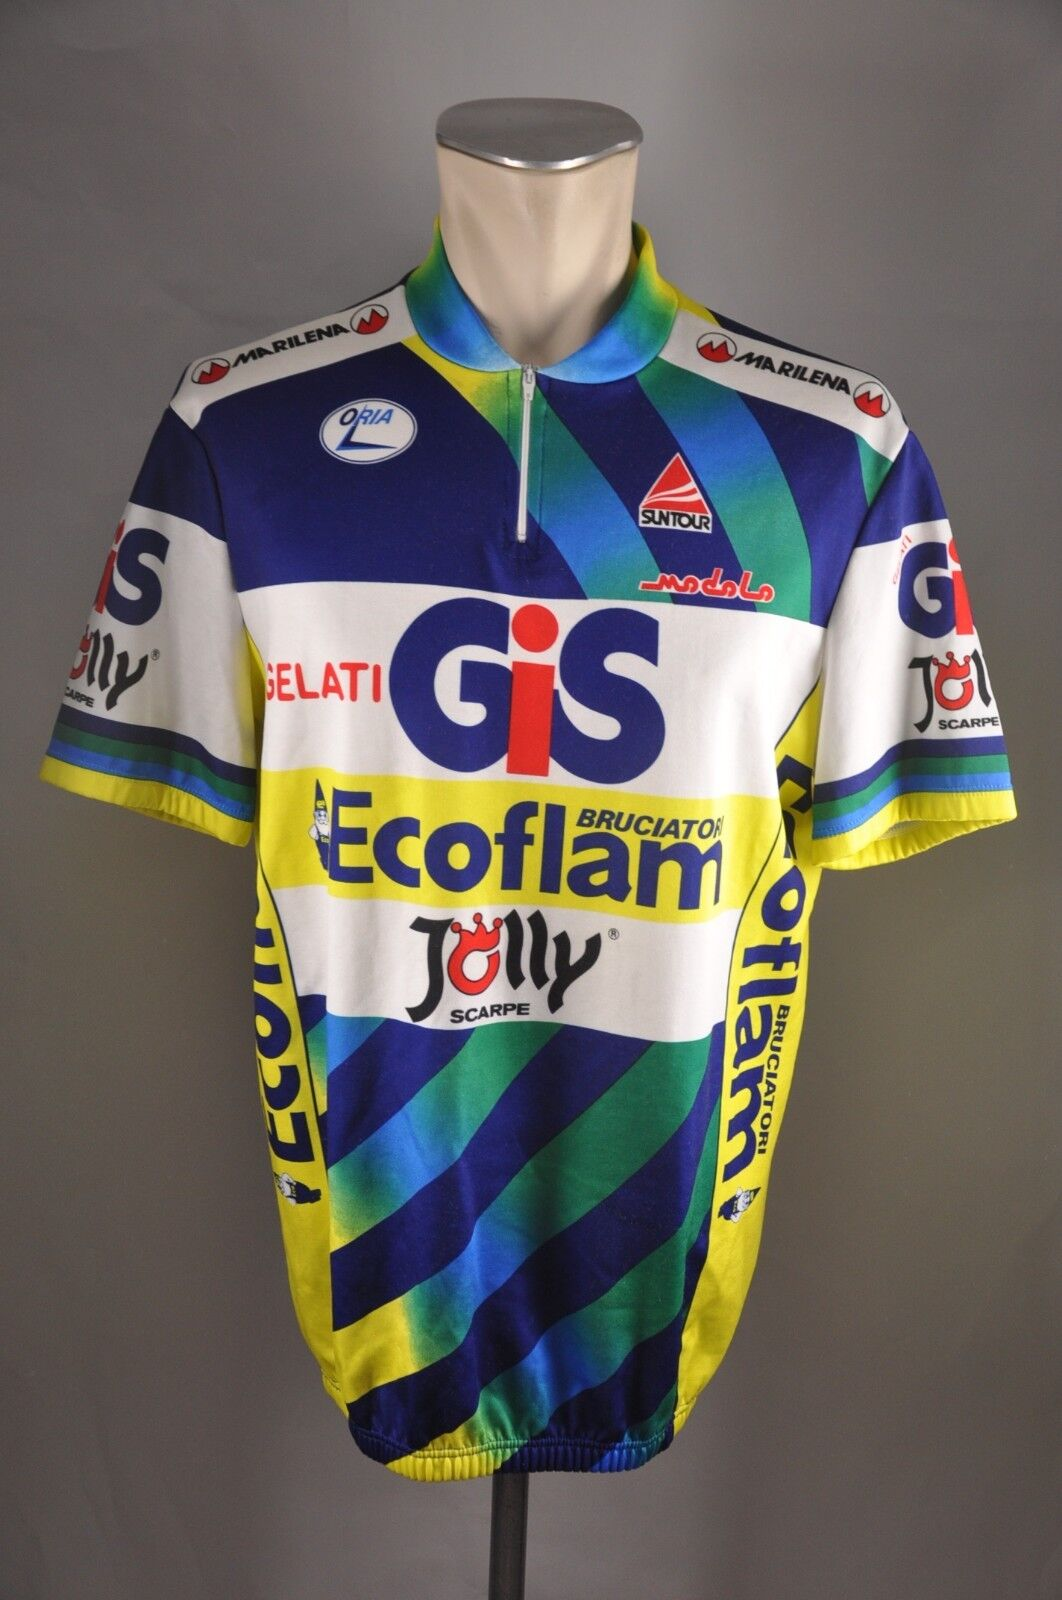 Gelati GIS Marilena Team jersey bike Gr 7 BW 57cm cycling Trikot KE7